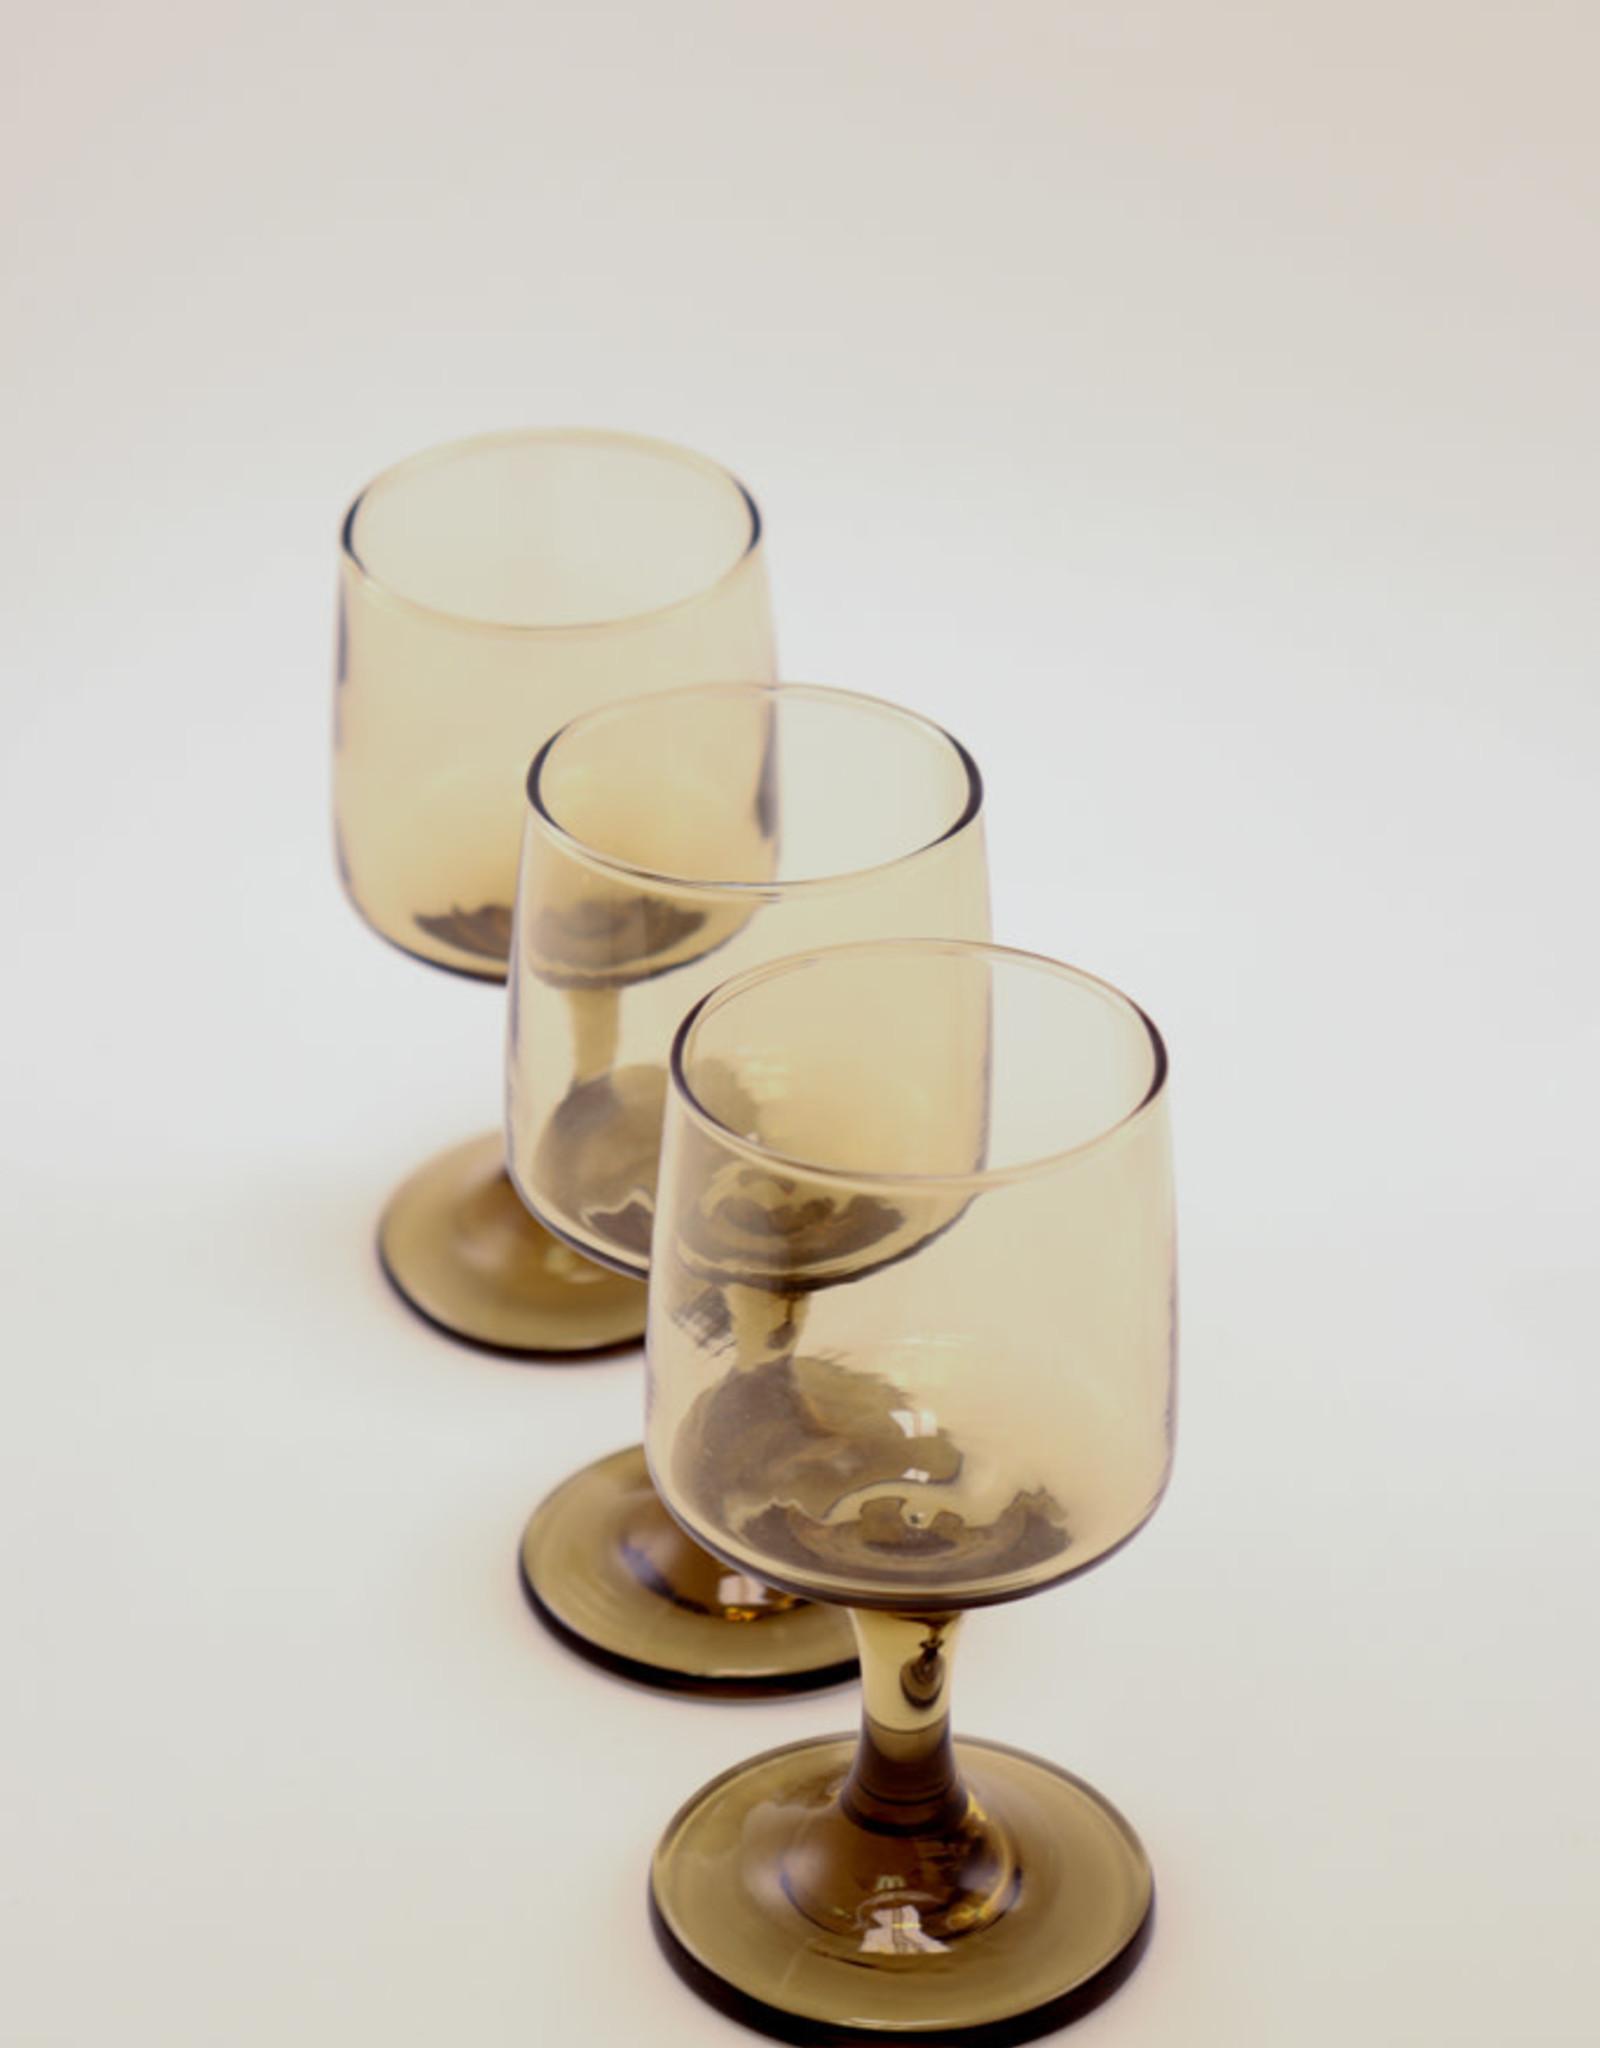 Libbey Vintage Tawny Libbey/Wine/Juice Glass